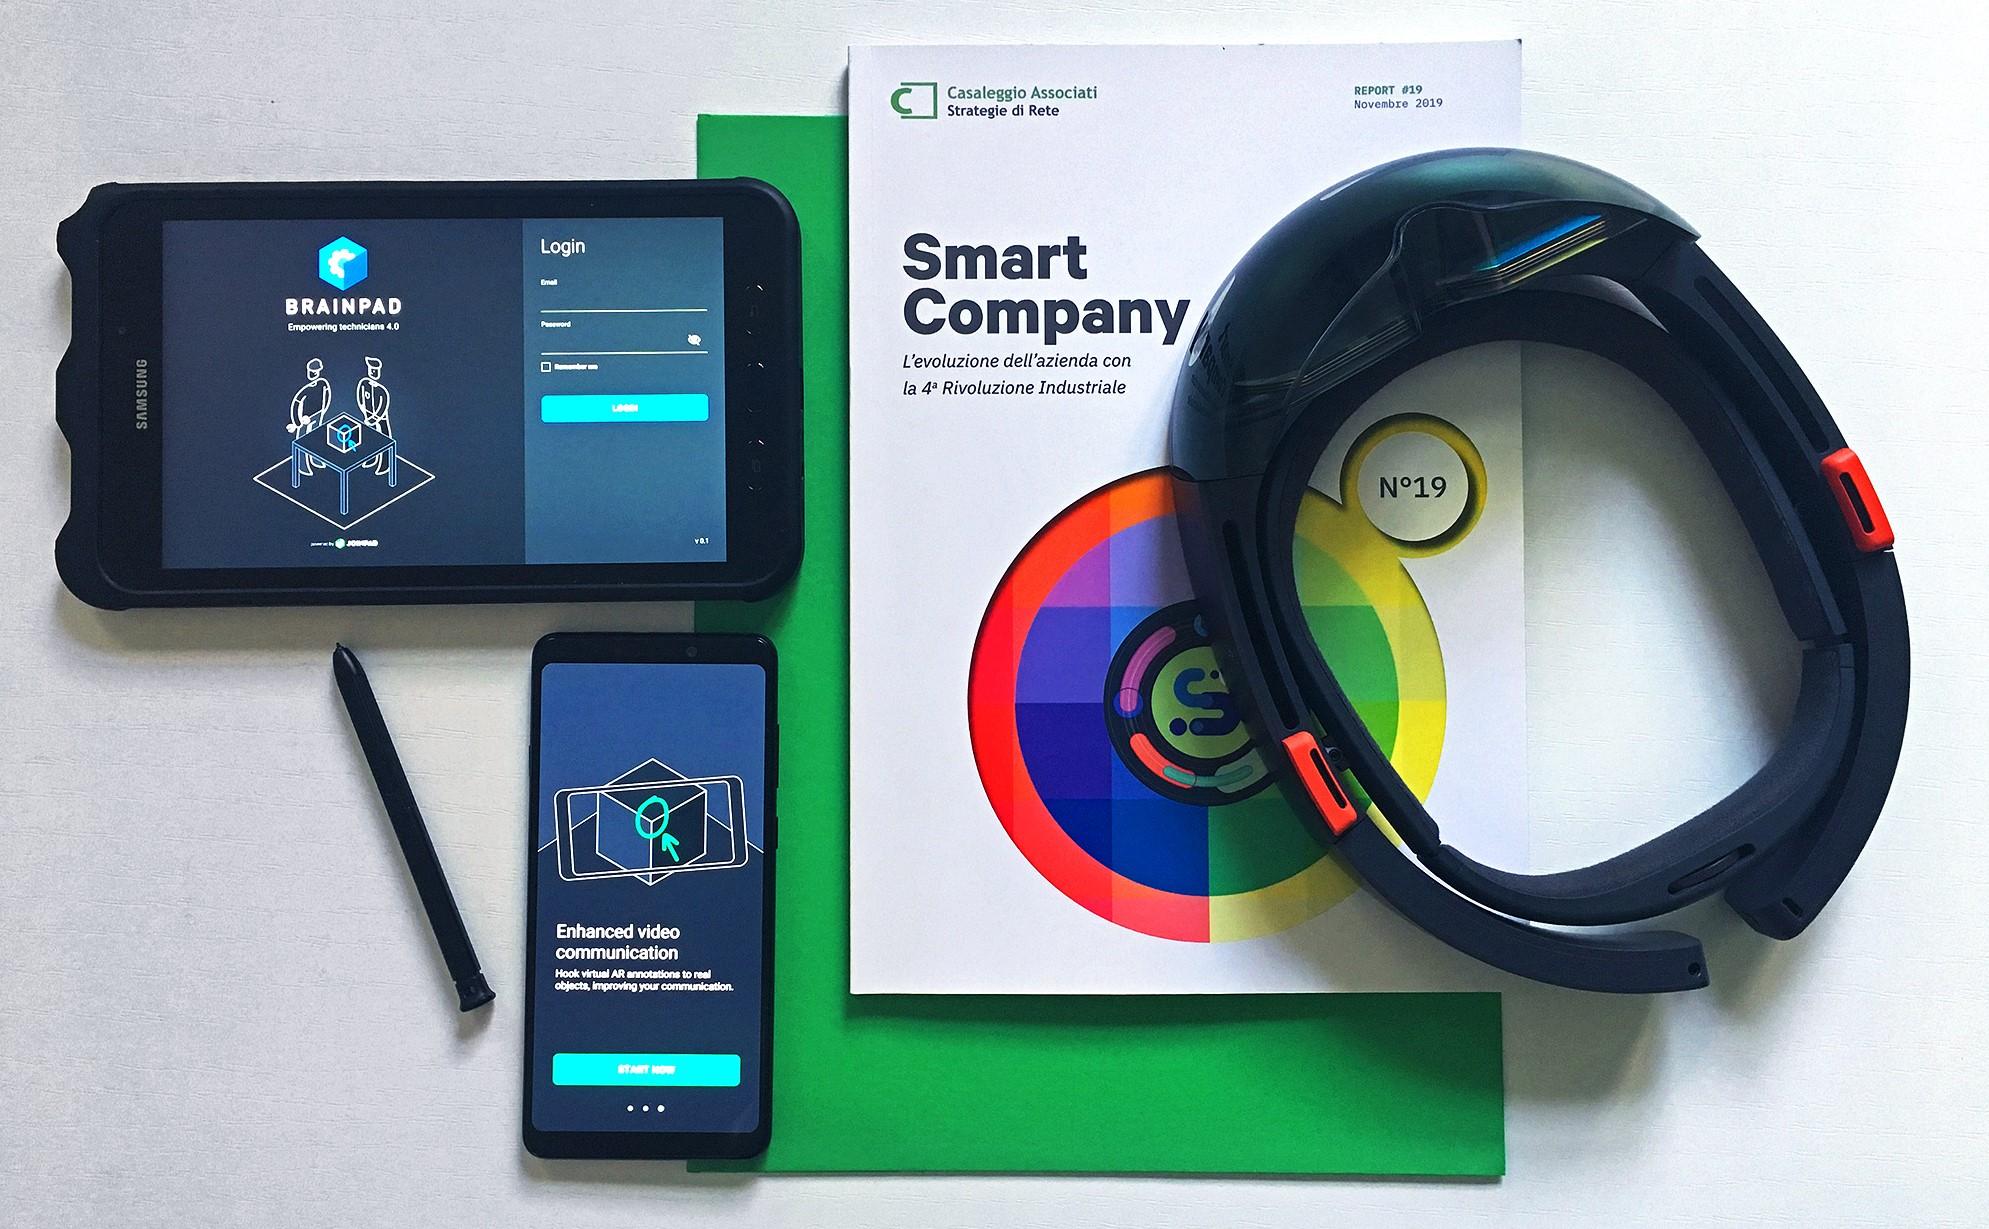 Report Casaleggio Smart Company Microsoft Hololens Tab Active 2 smartphone